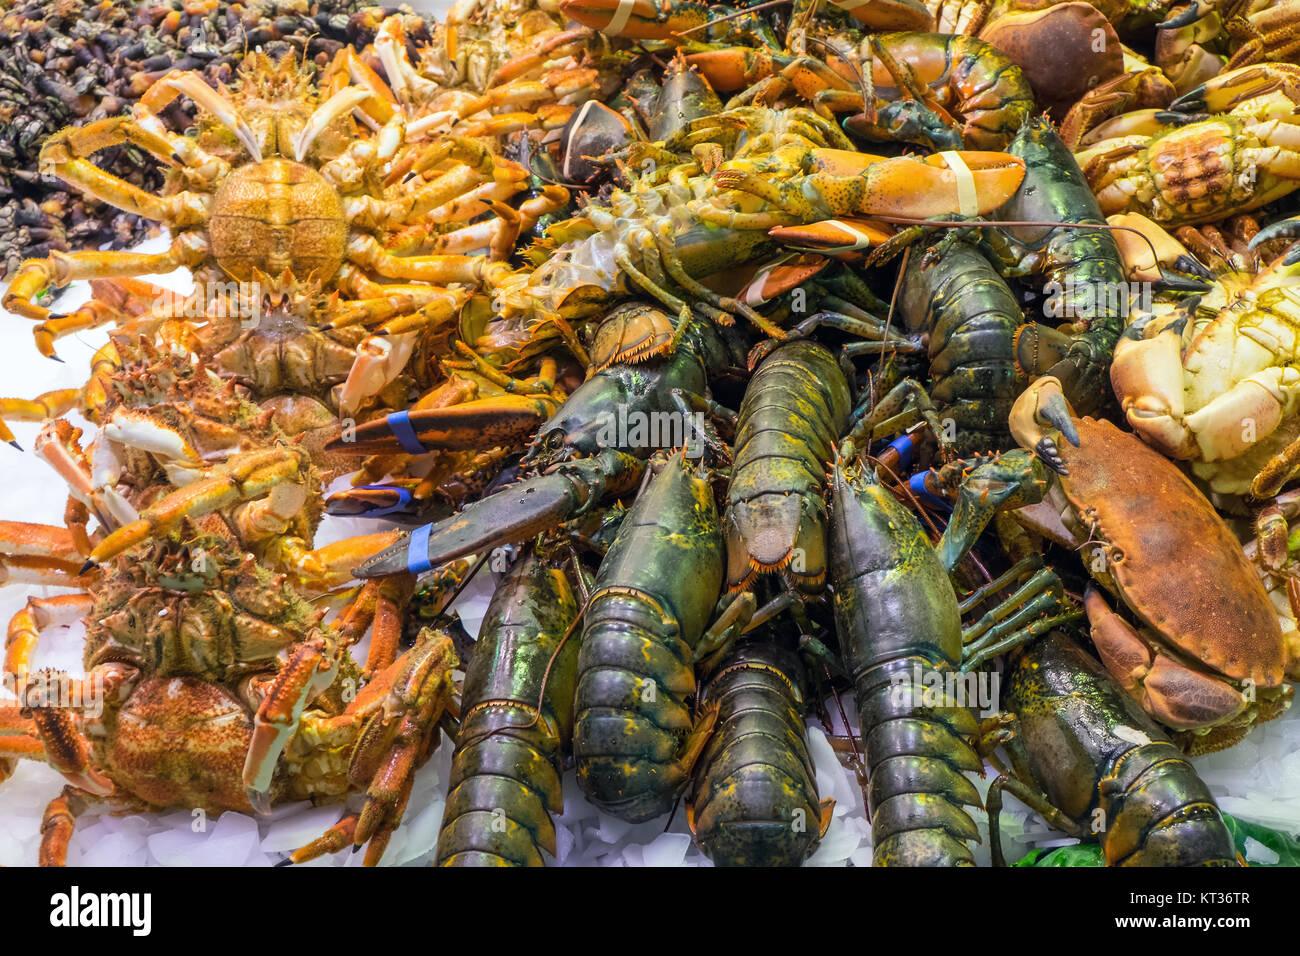 crustaceans on the boqueria market in barcelona,u200bu200bspain - Stock Image